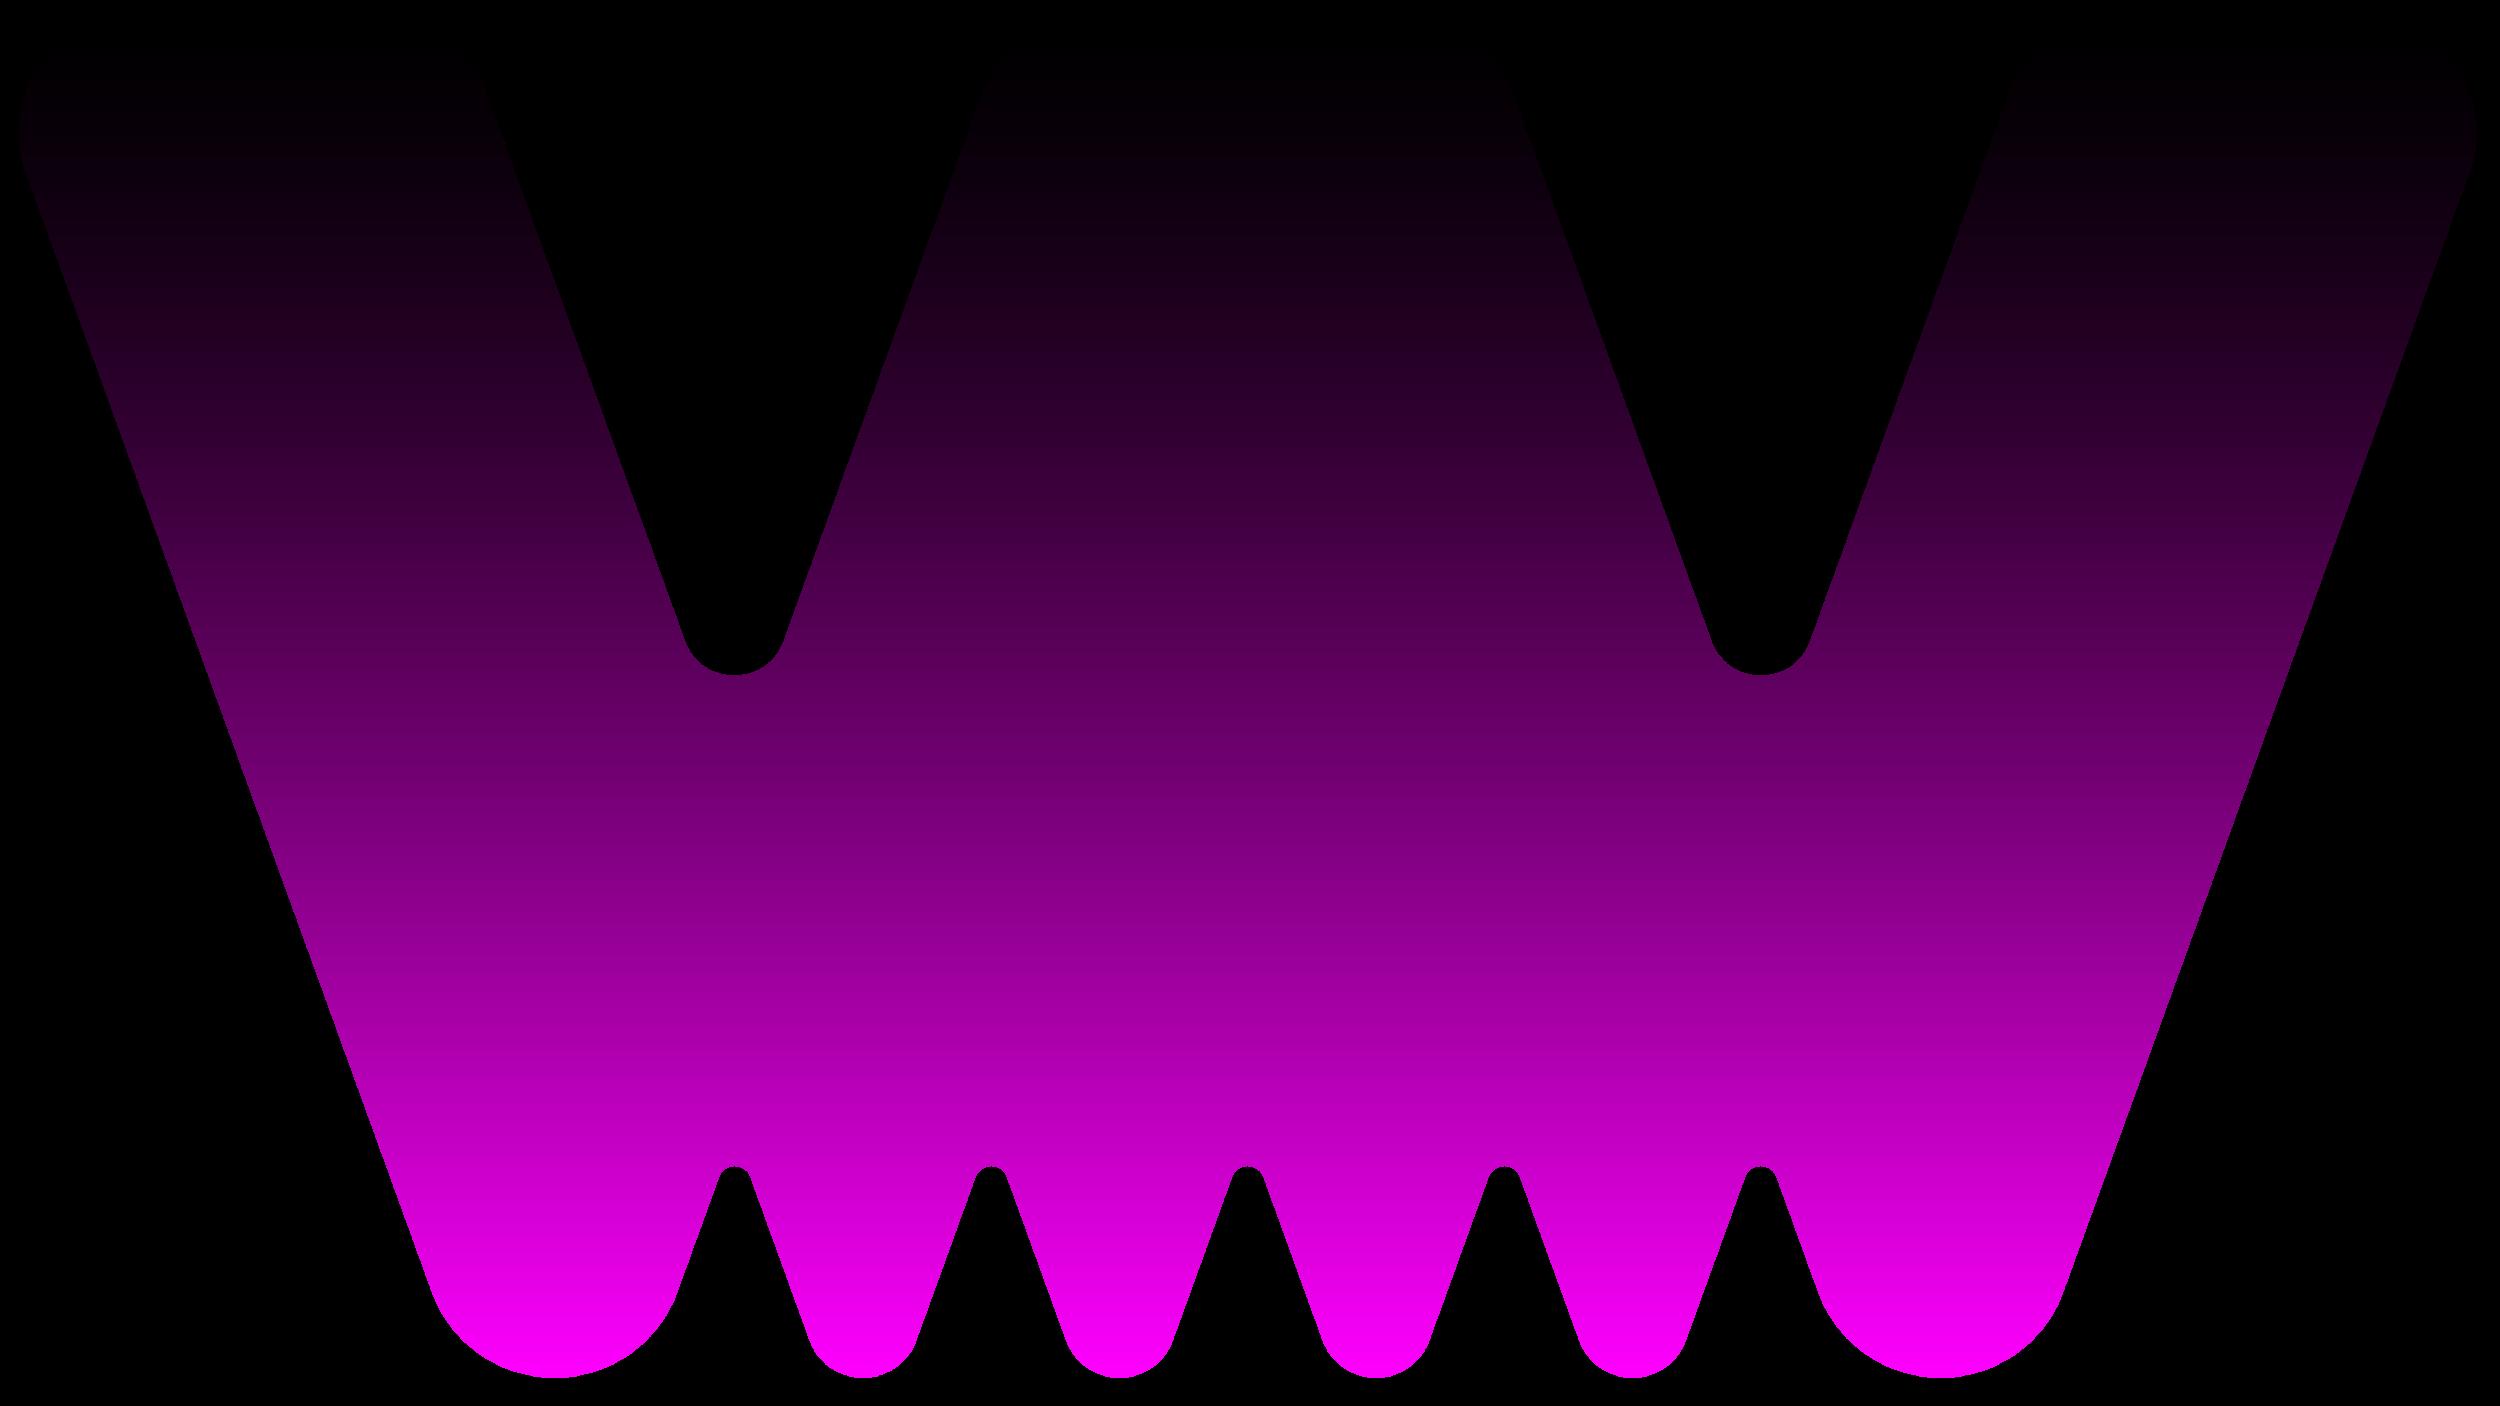 WildDingo_W_Symbol_RGB_Patterns-10.png